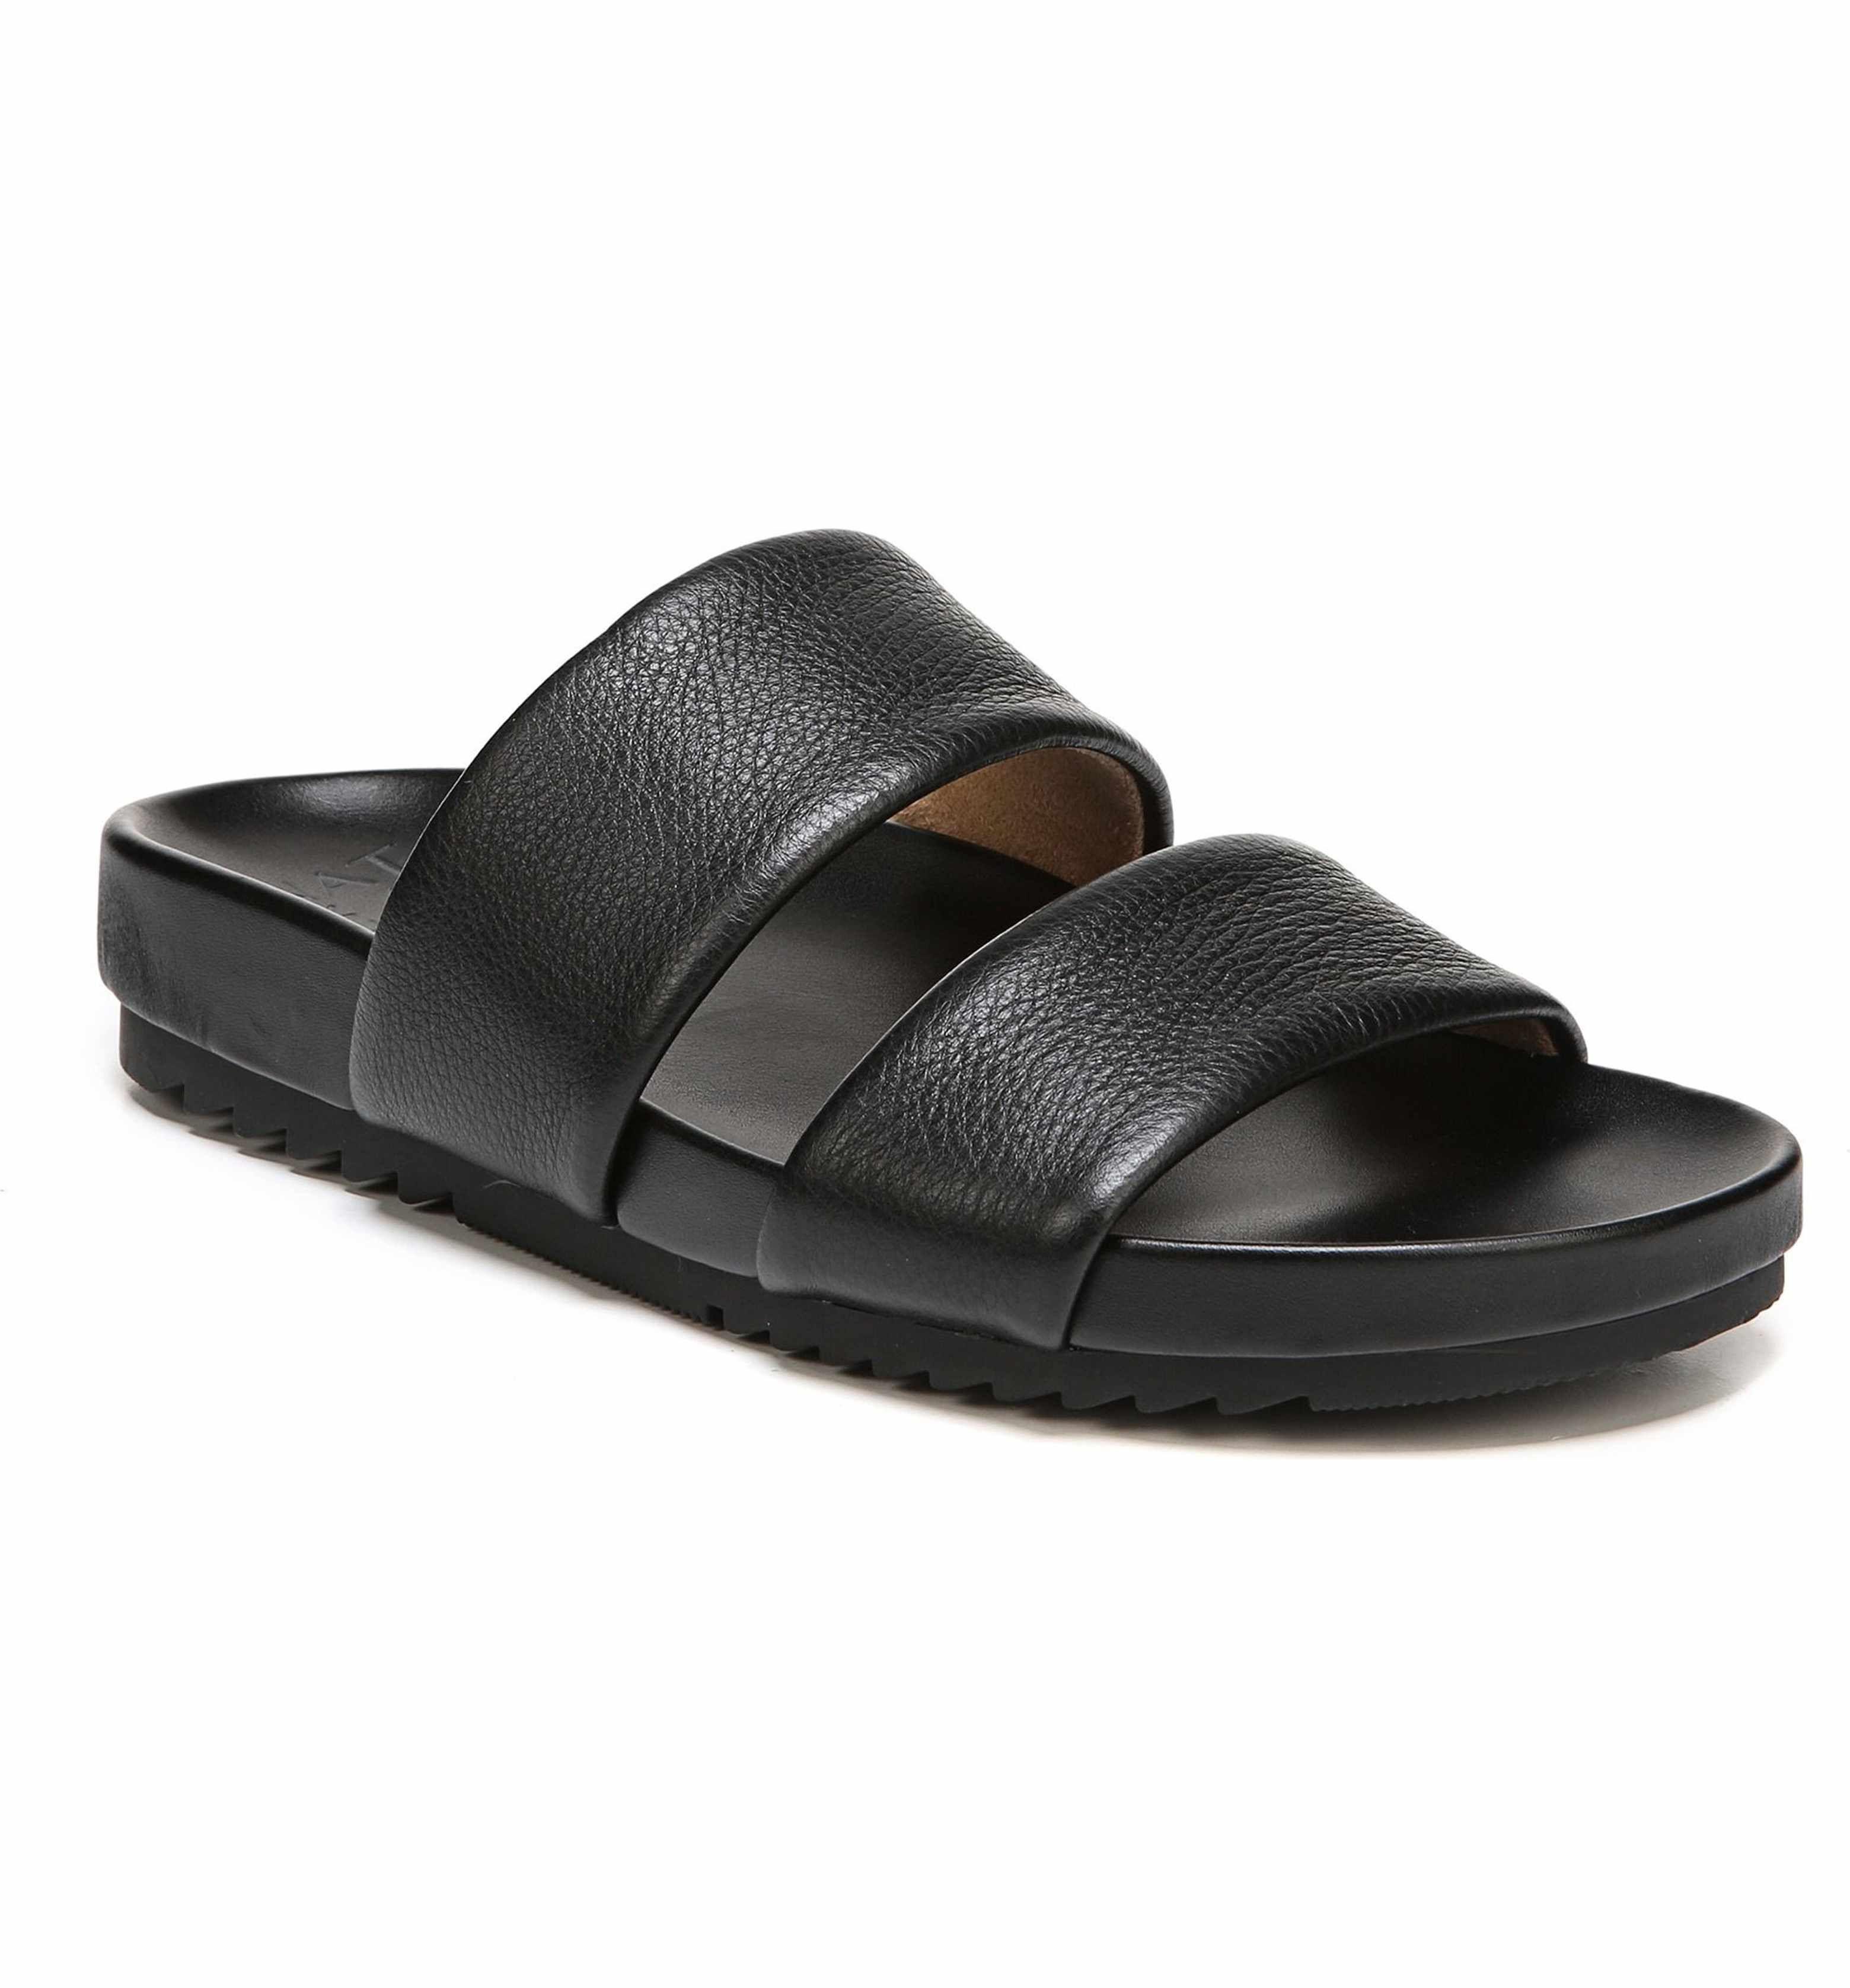 Naturalizer Amabella Slide Sandal Women  Sandals, Womens -3630